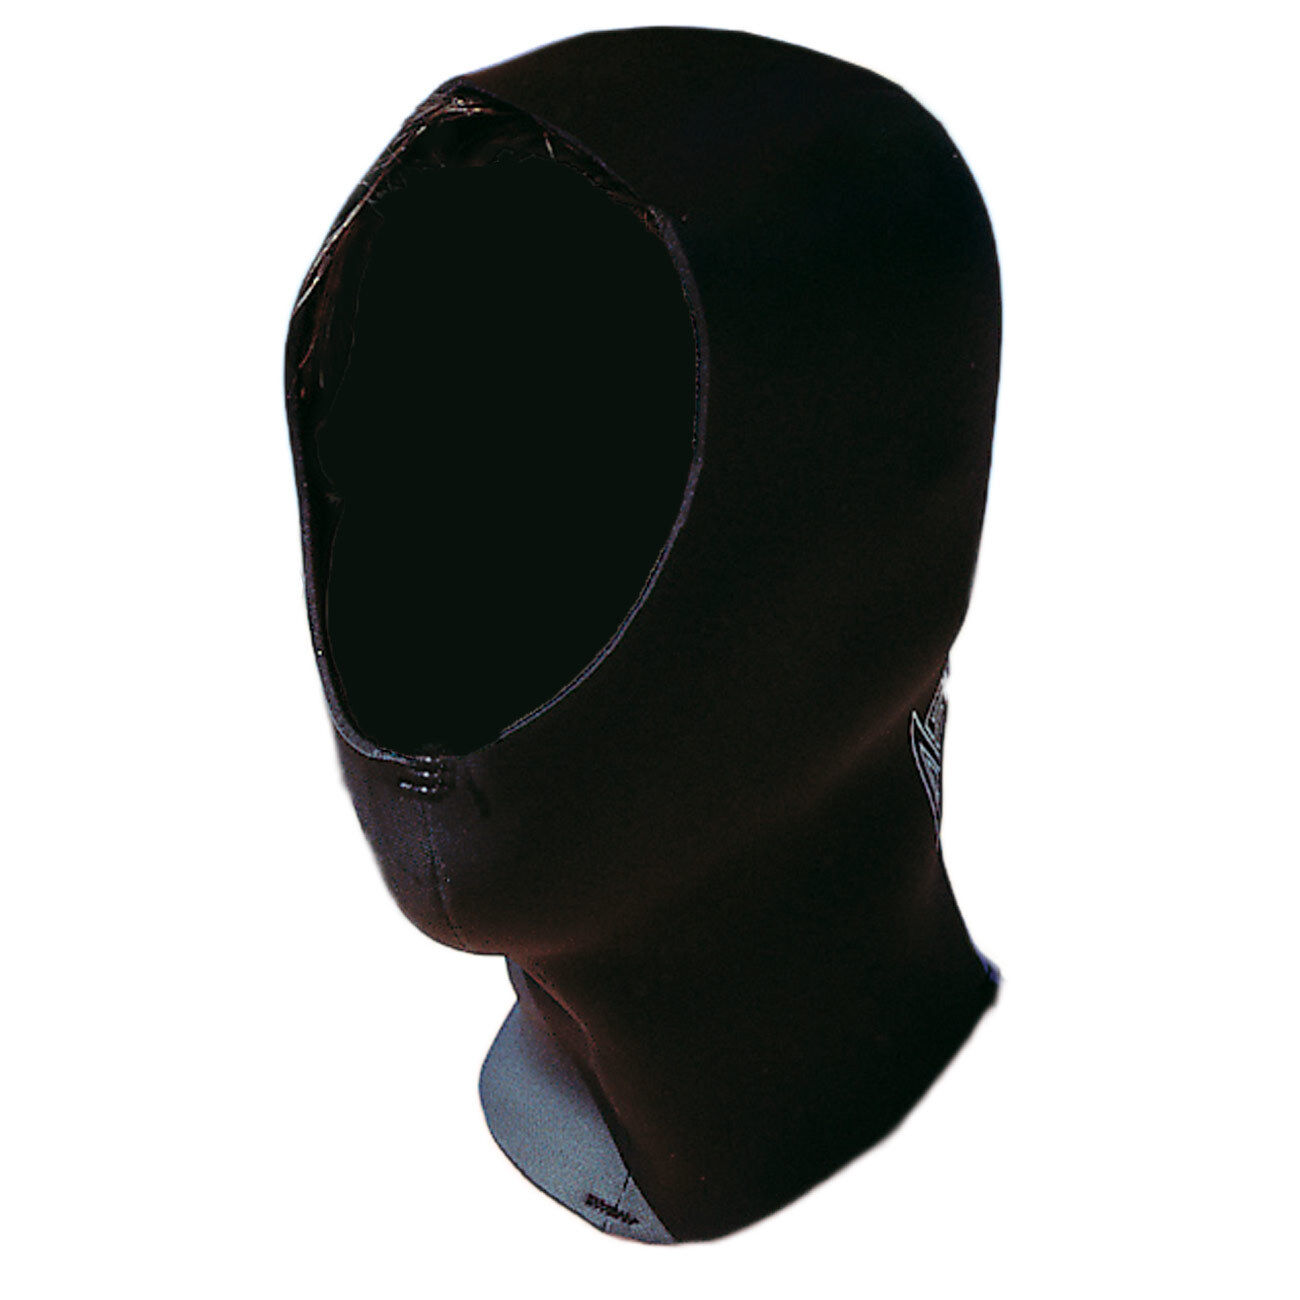 ASCAN Neopren-Kopfhaube Neoprenanzug Surfanzug Segeln Surfen Kälteschutz NEU